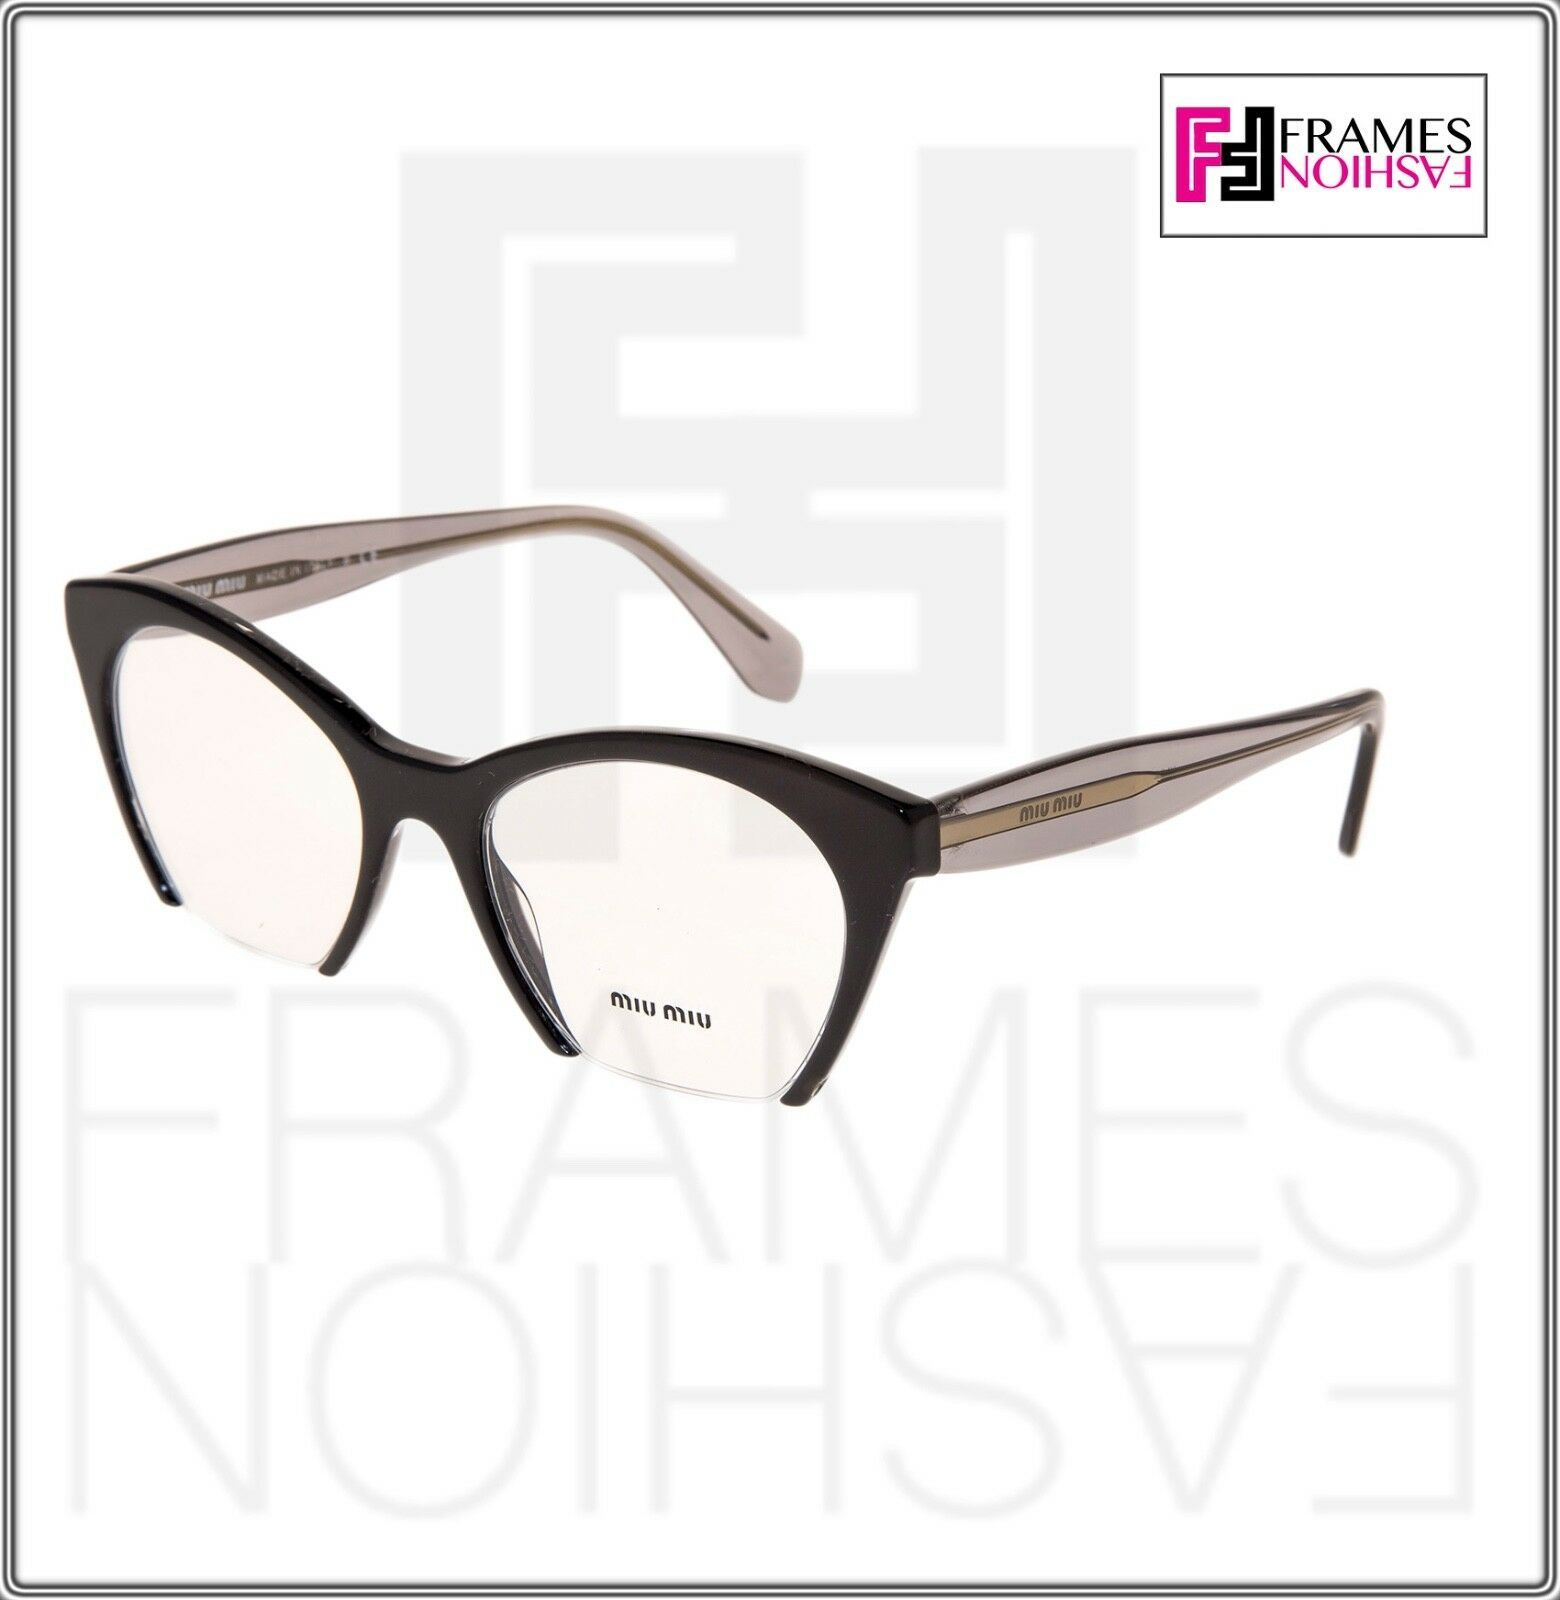 MIU MIU RASOIR MU03QV Eyeglasses Optical Frame Black Grey Translucent 51mm 03Q image 7